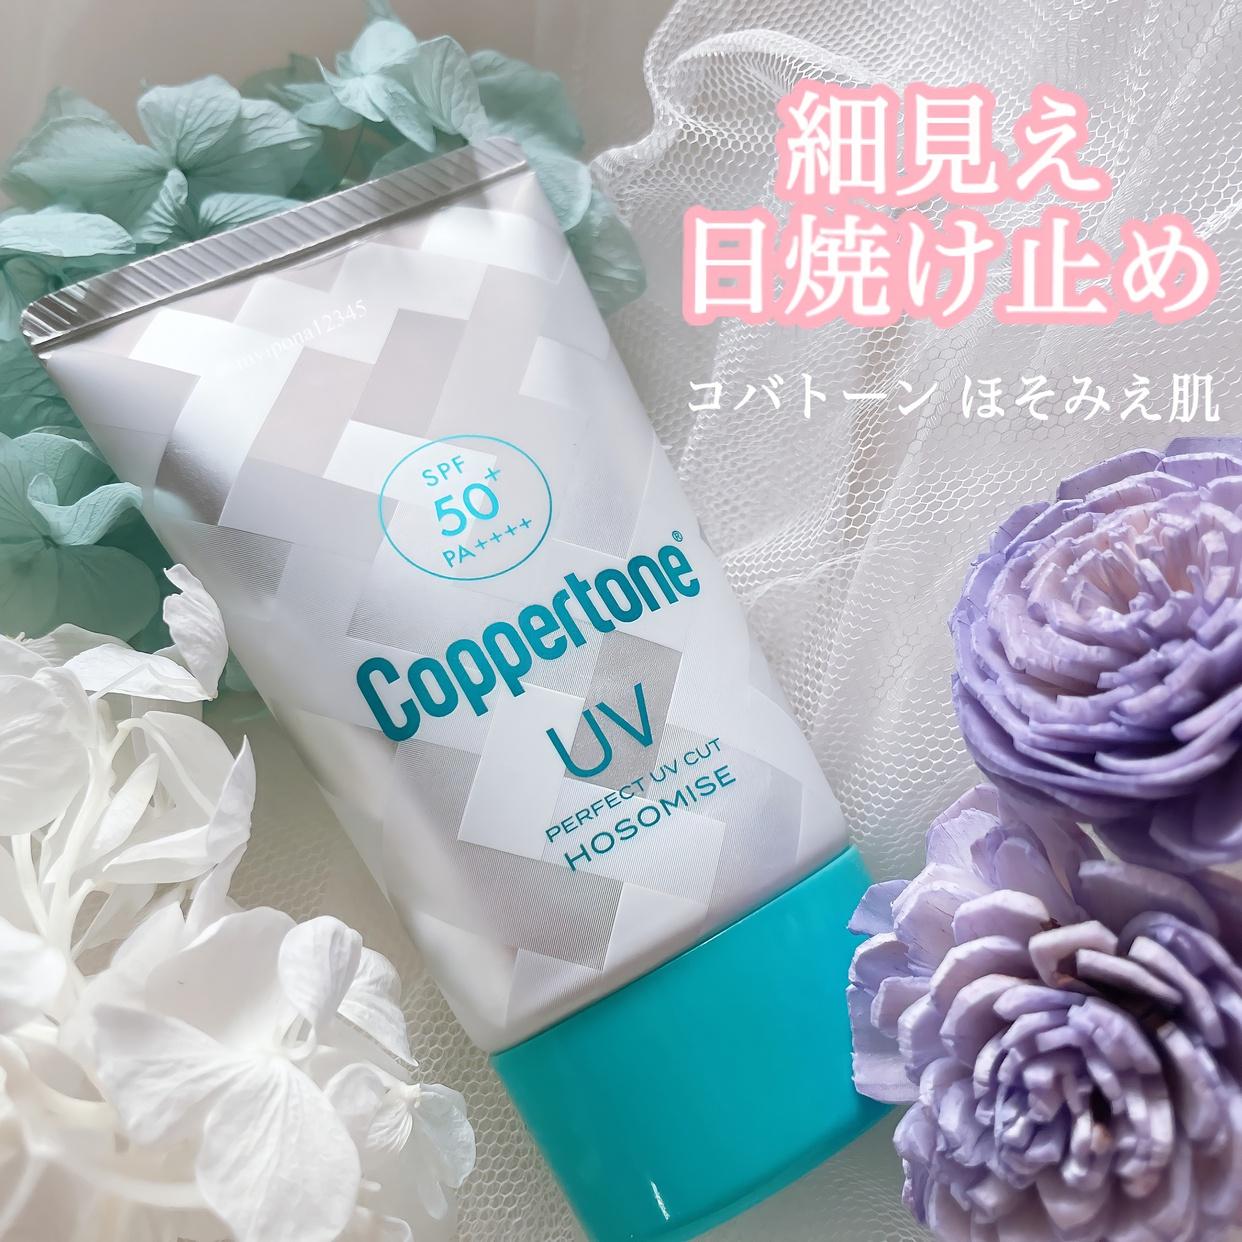 Coppertone(コパトーン) キレイ魅せUV ほそみせ肌を使ったみぃぽなさんのクチコミ画像1